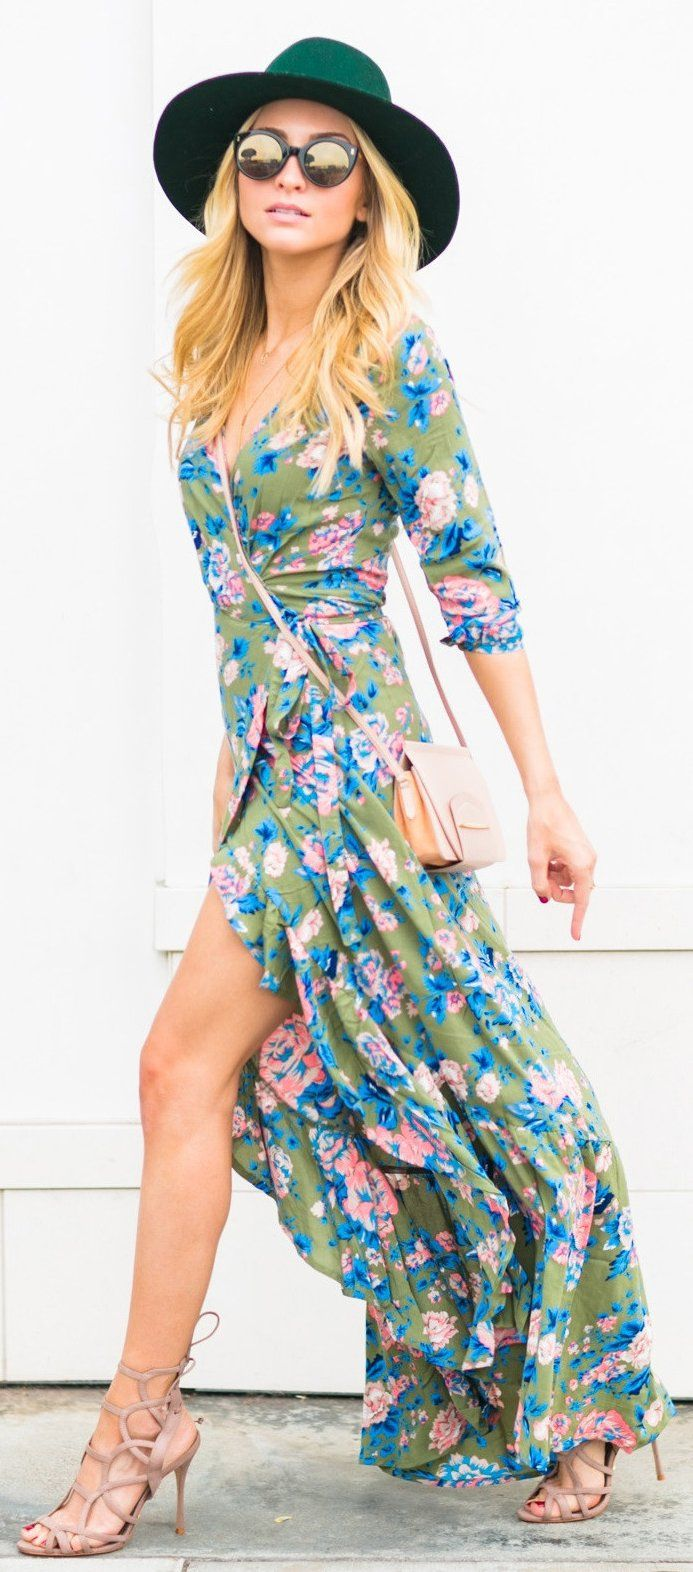 Fashion style Spring stylish dresses for lady